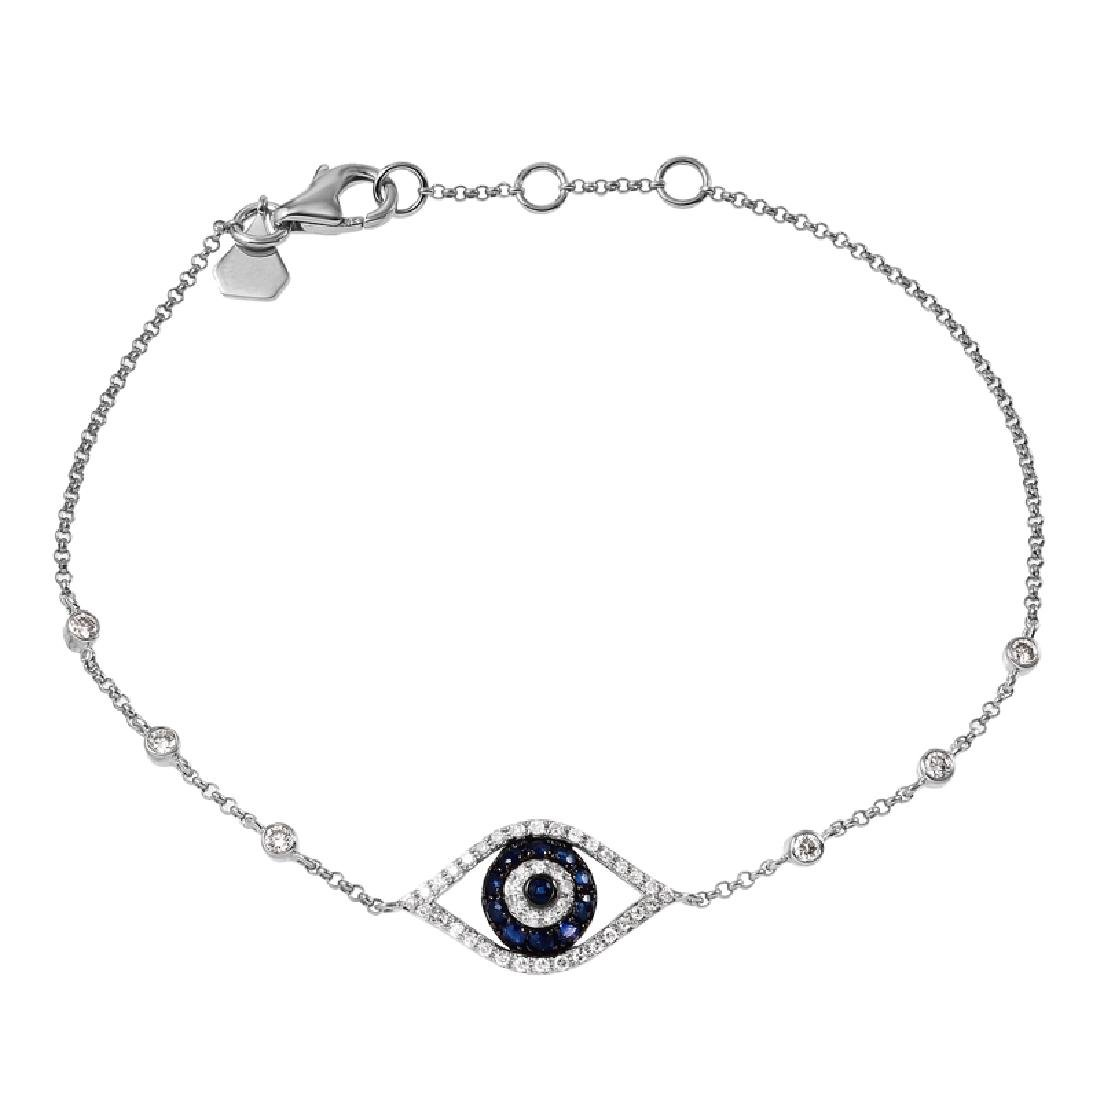 14KT White Gold Diamond & Sapphire Bracelet